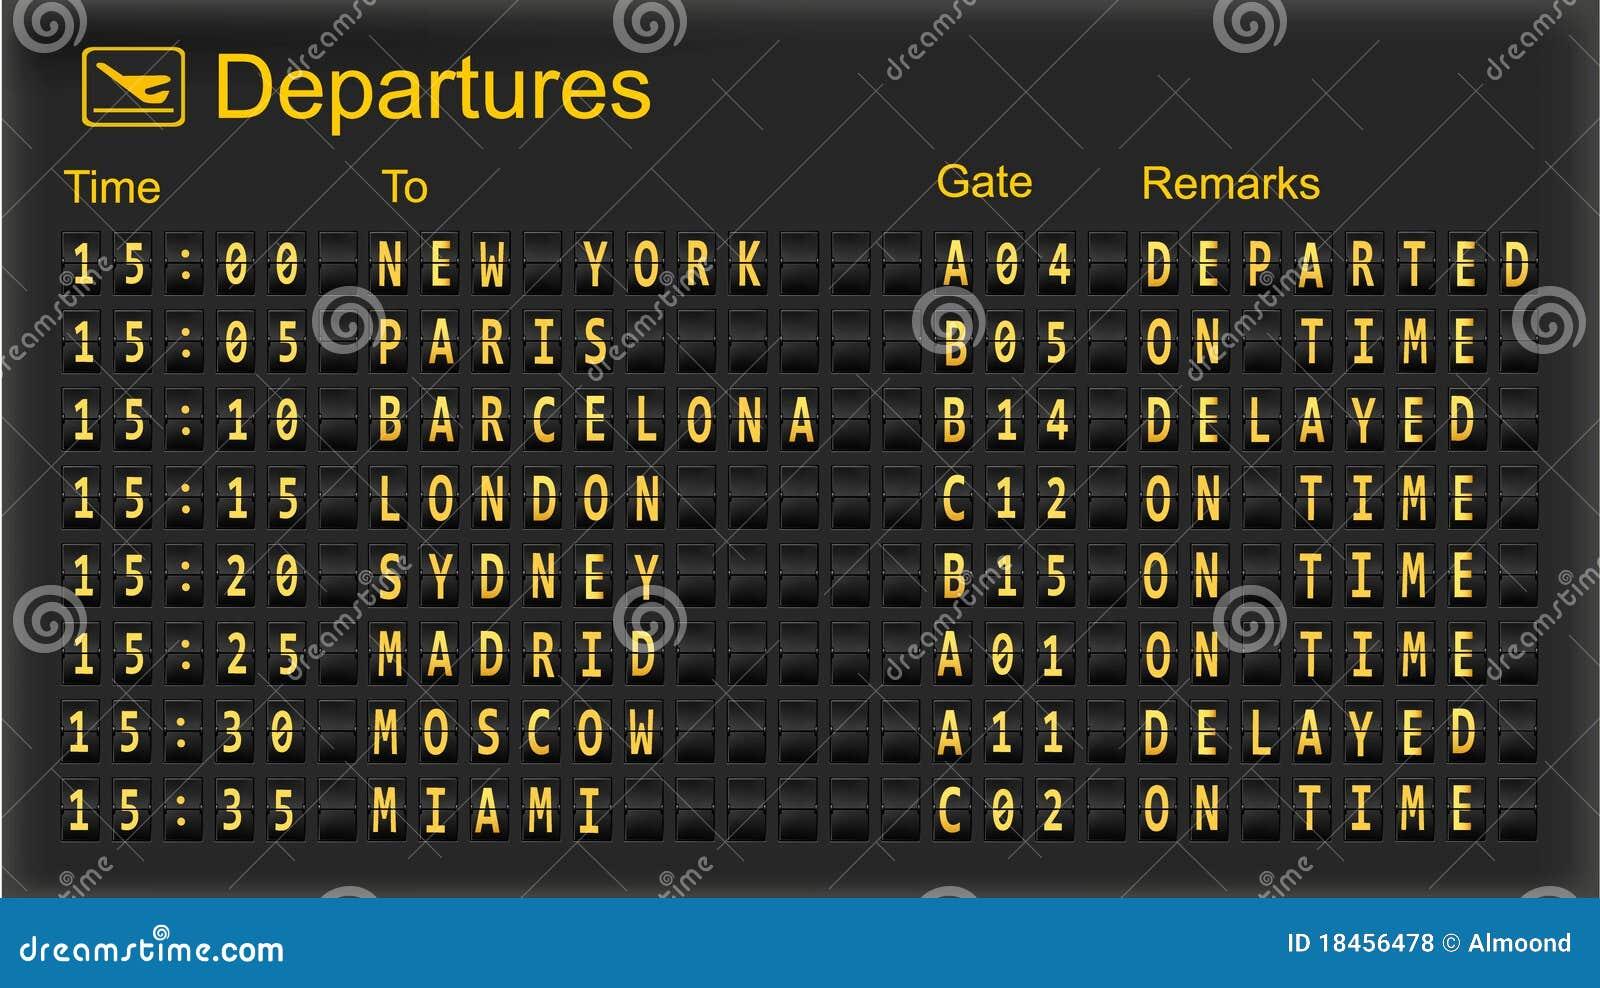 Split flap mechanical departures board.